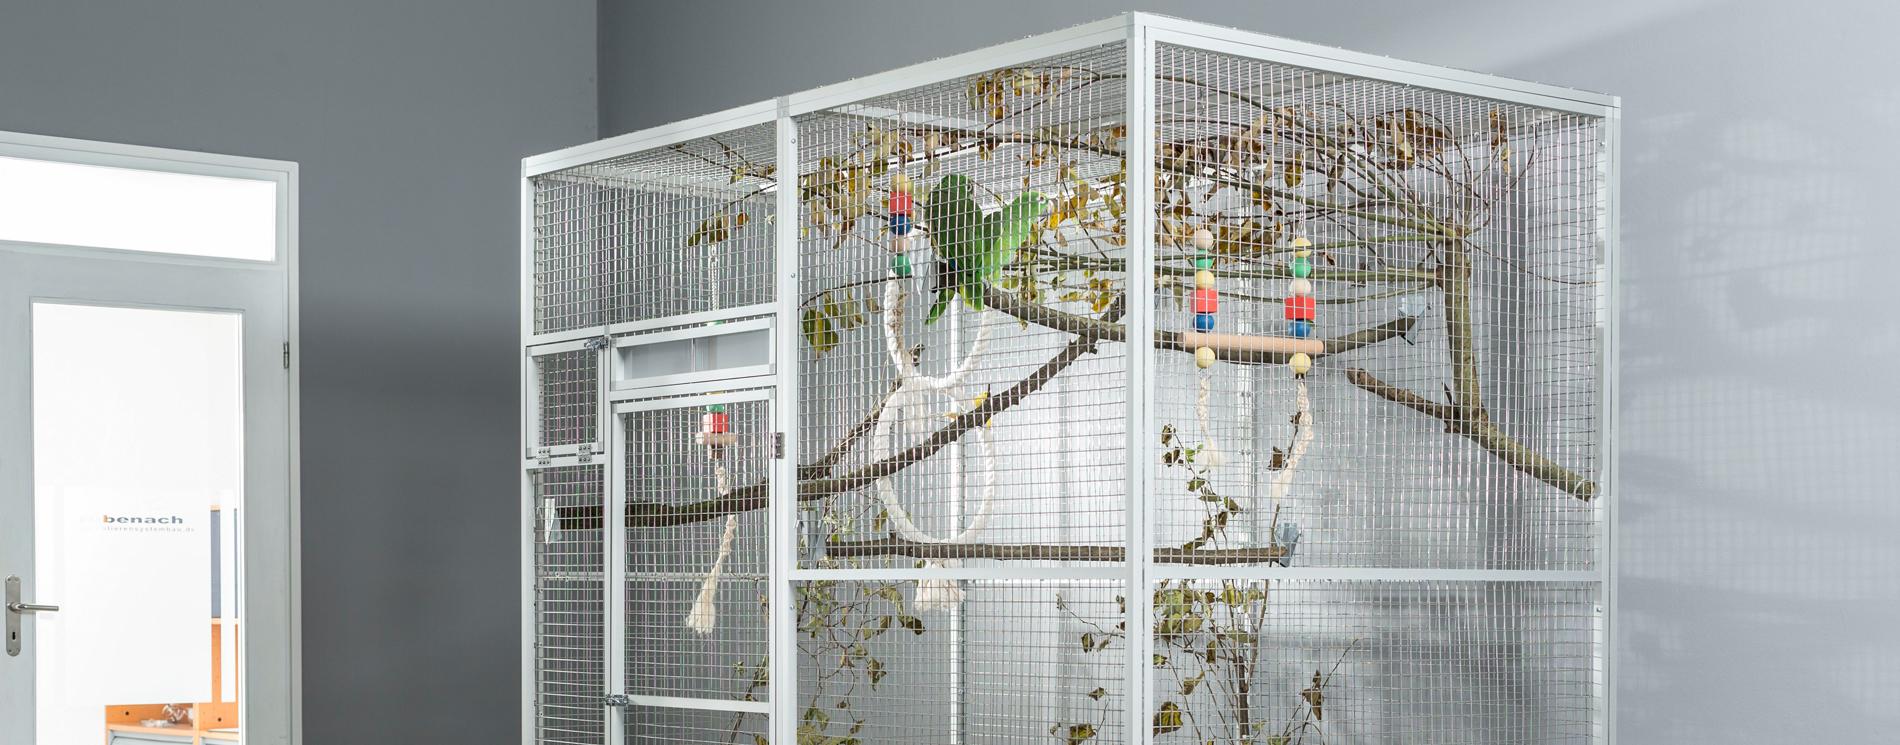 Papageien Voliere Selber Bauen